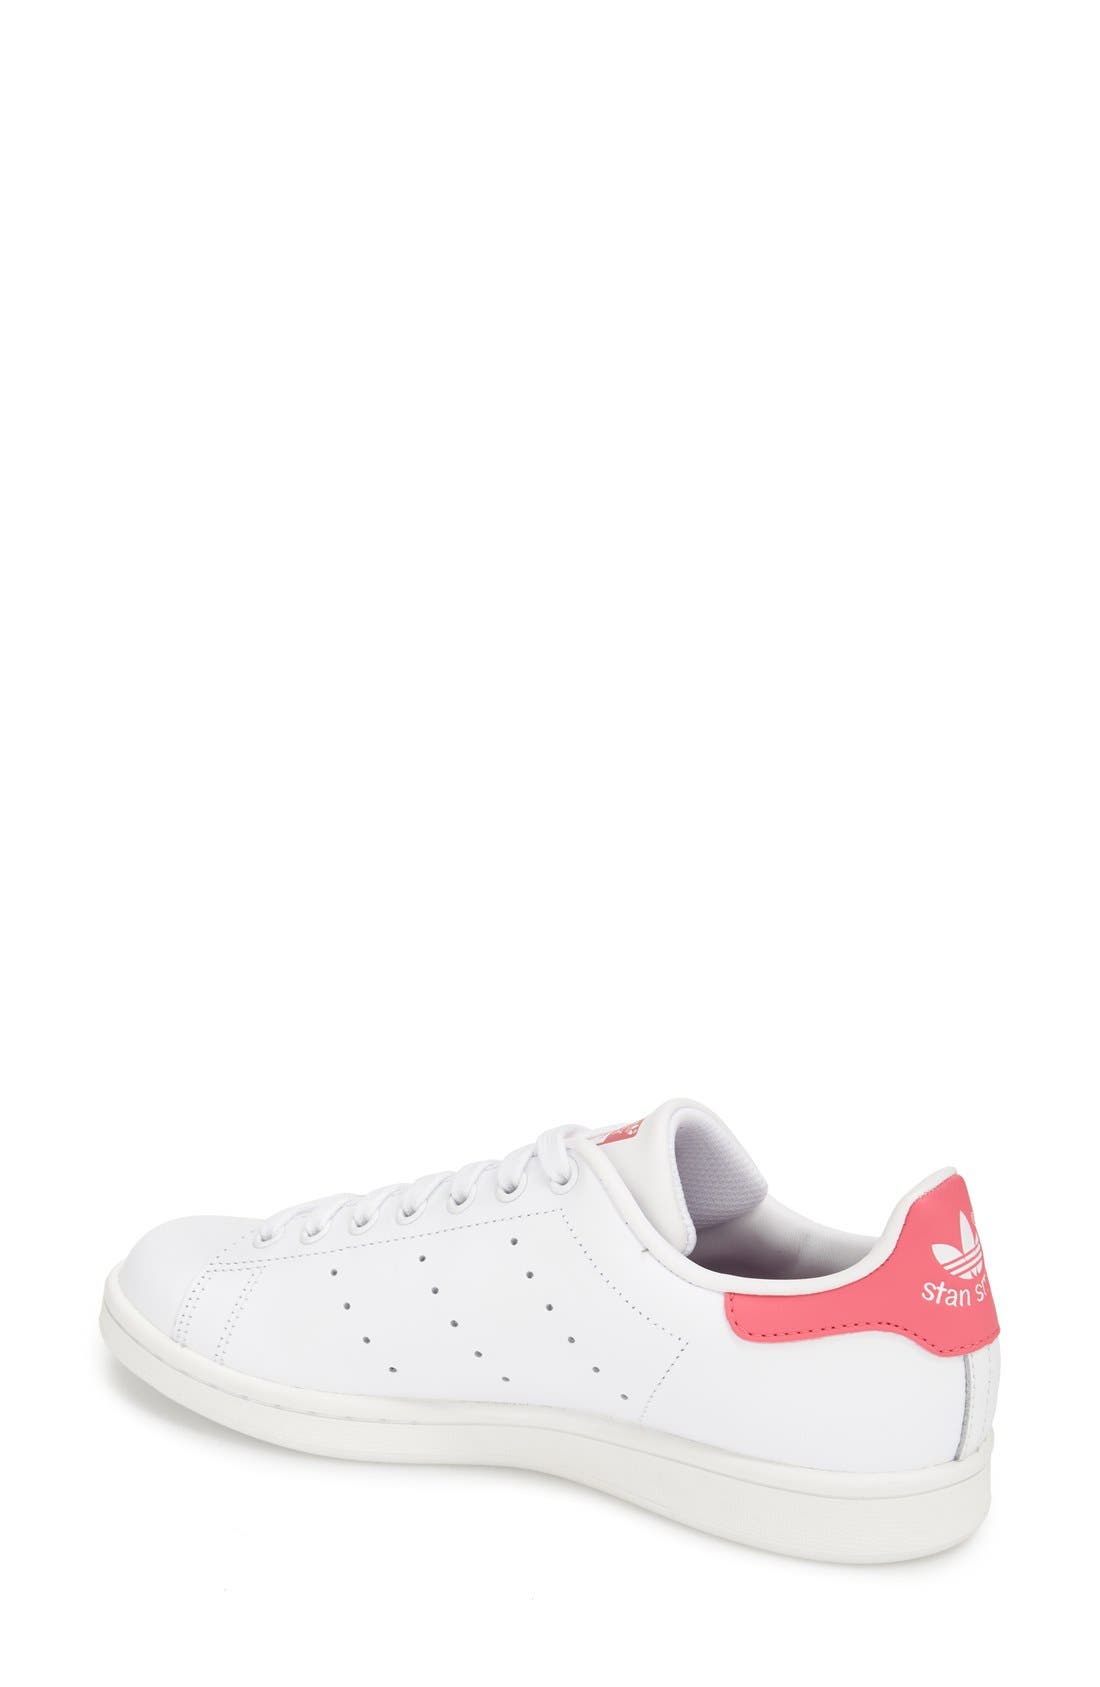 'Stan Smith' Sneaker,                             Alternate thumbnail 103, color,